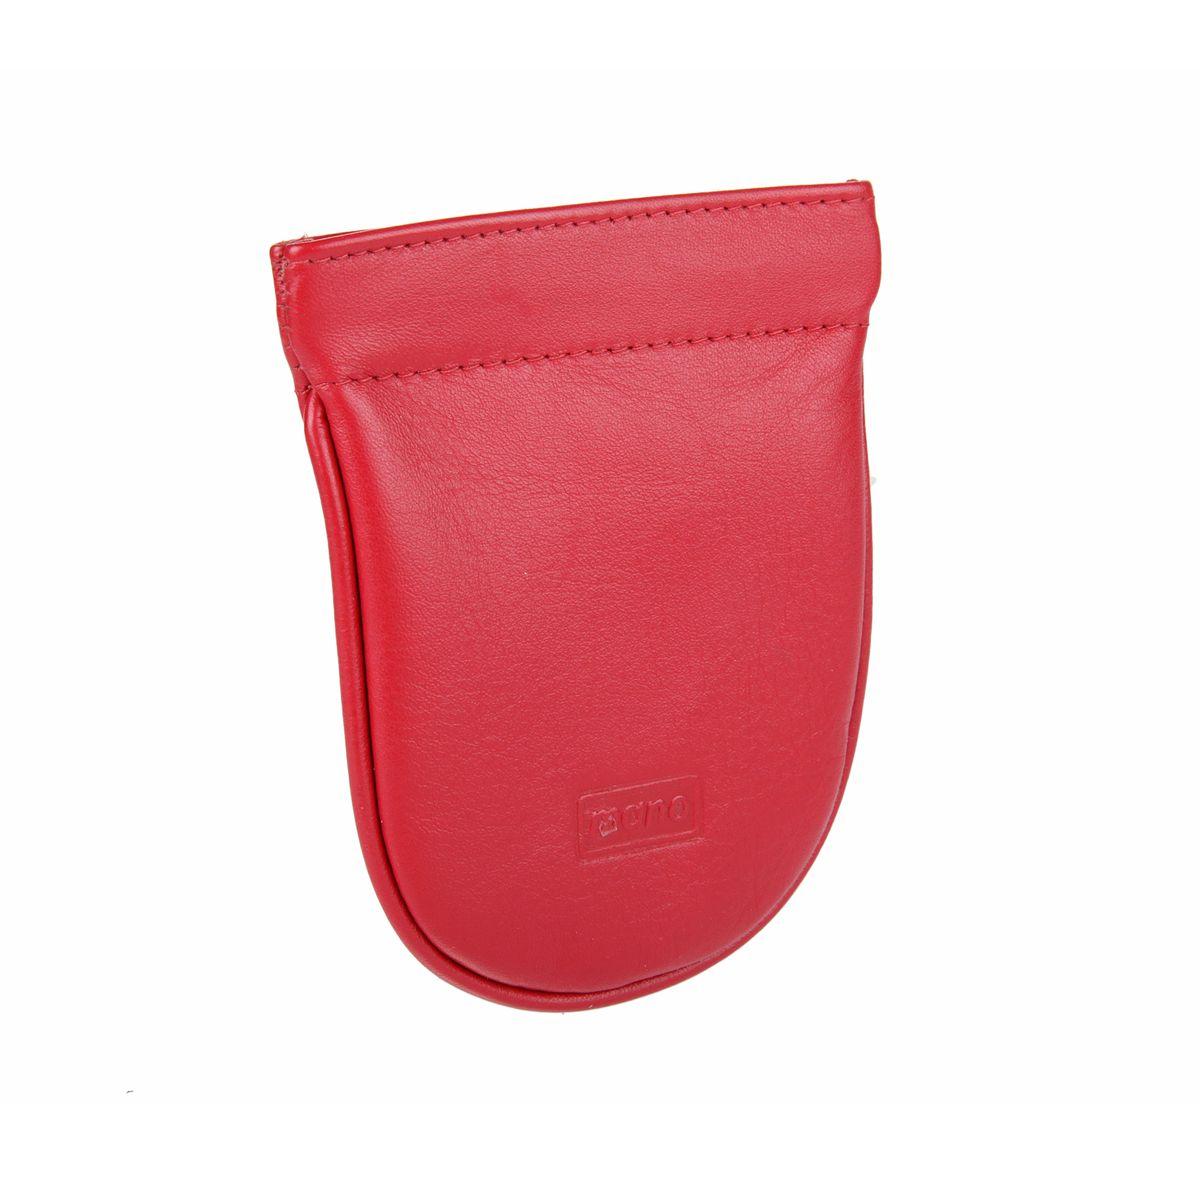 Ключница Mano, цвет: красный. 13417 13417 red